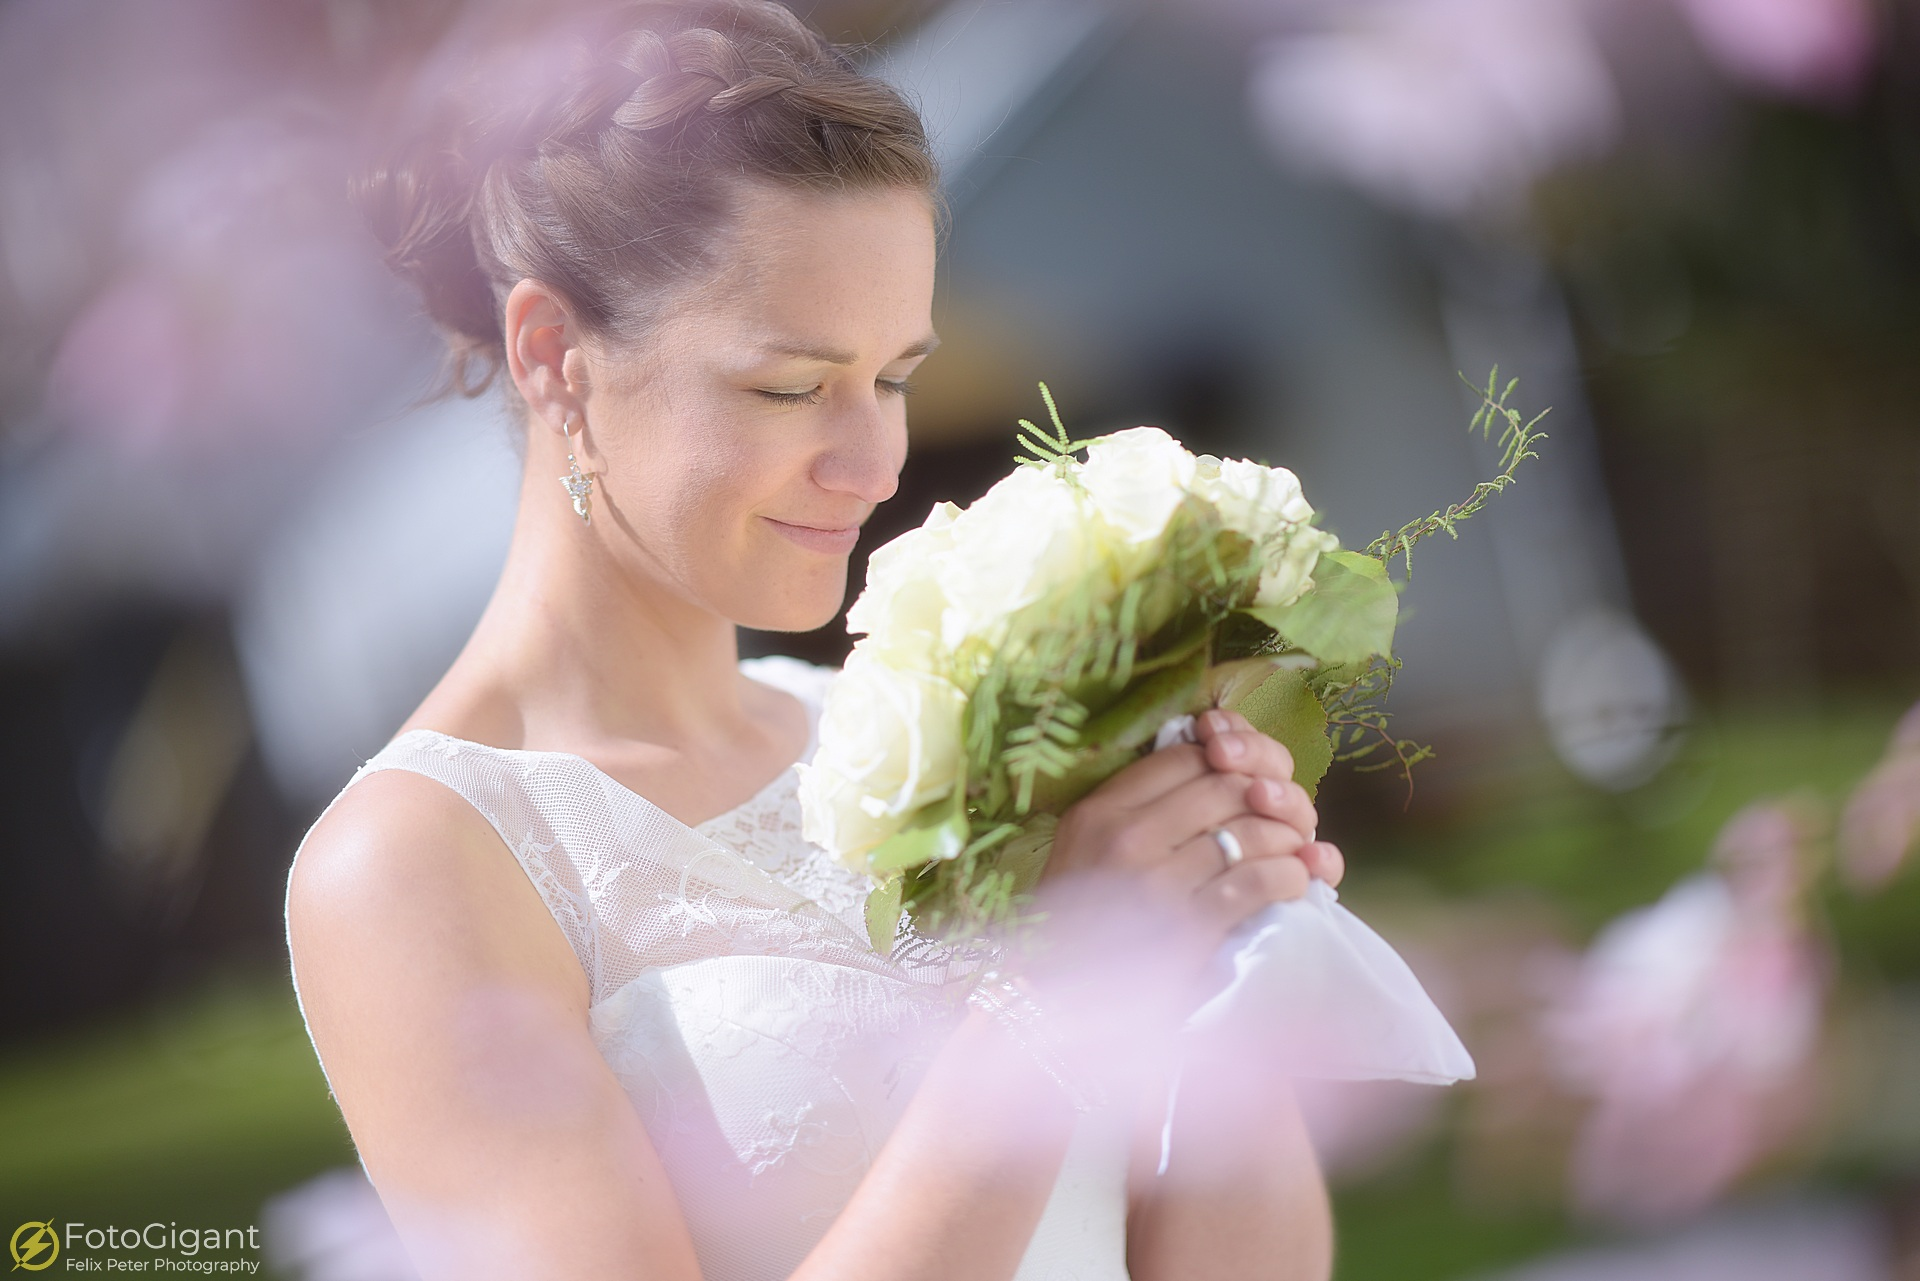 Hochzeitsfotografiekurs_Fotograf_Felix_Peter_30.jpg